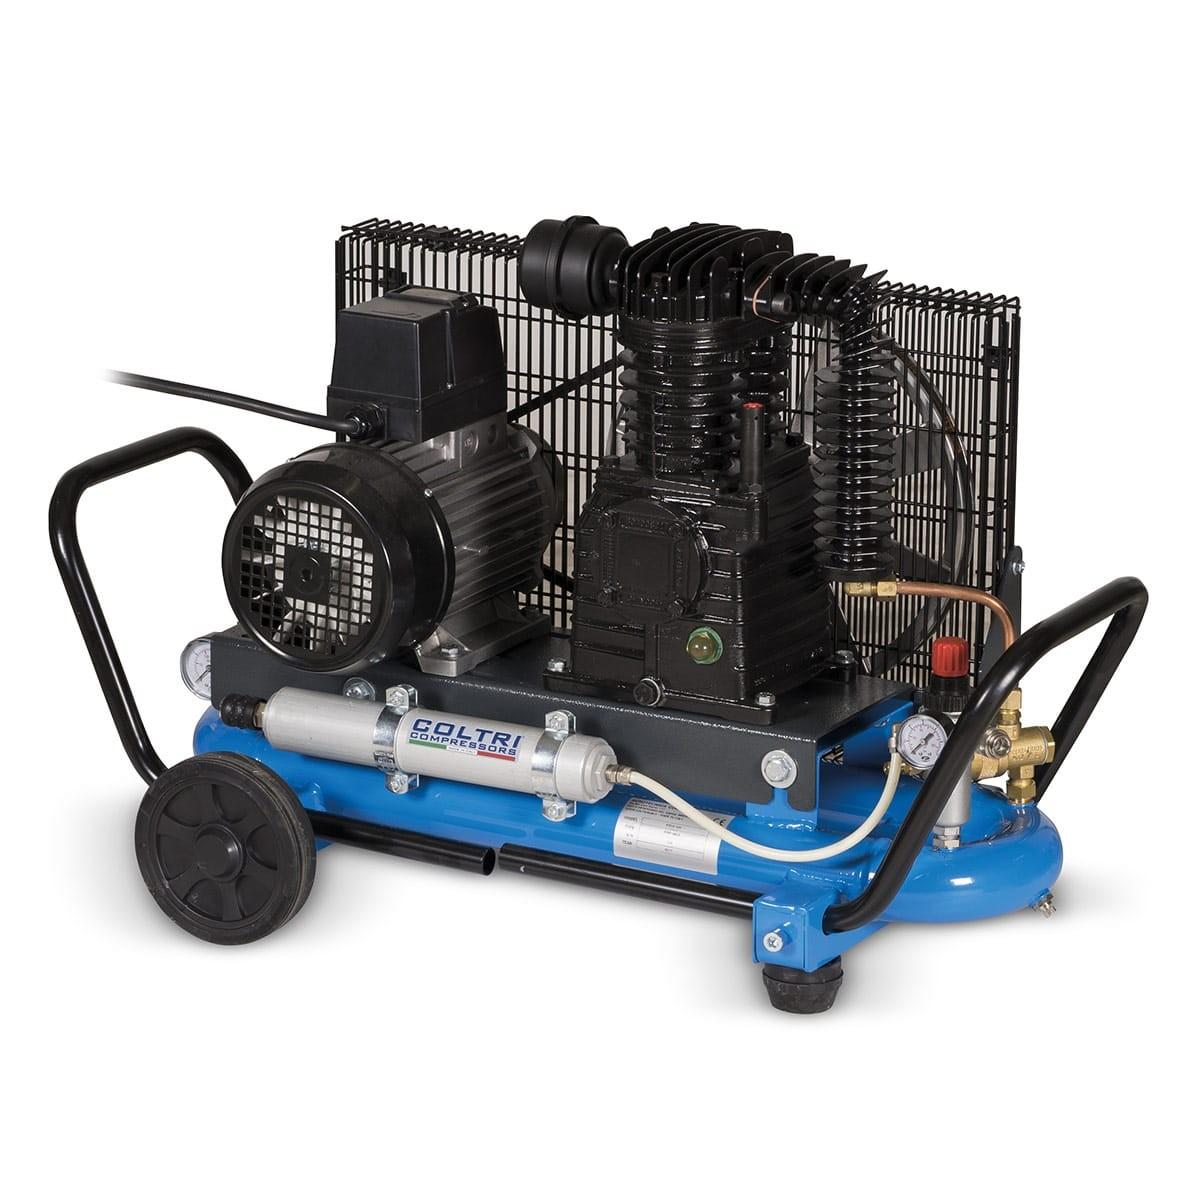 Coltri EOLO 330 Third Lung Portable Compressor